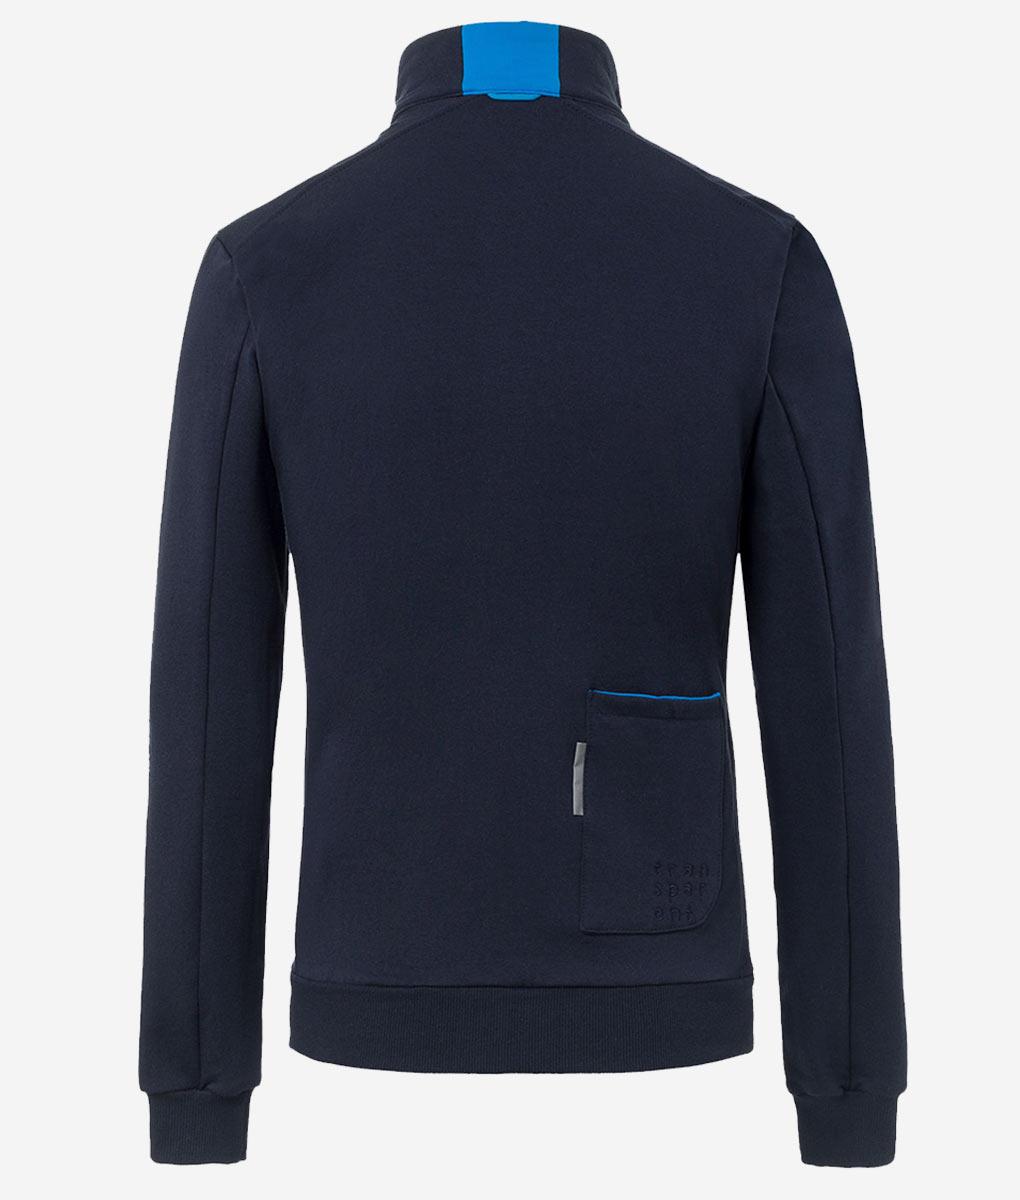 sudadera-azul-back